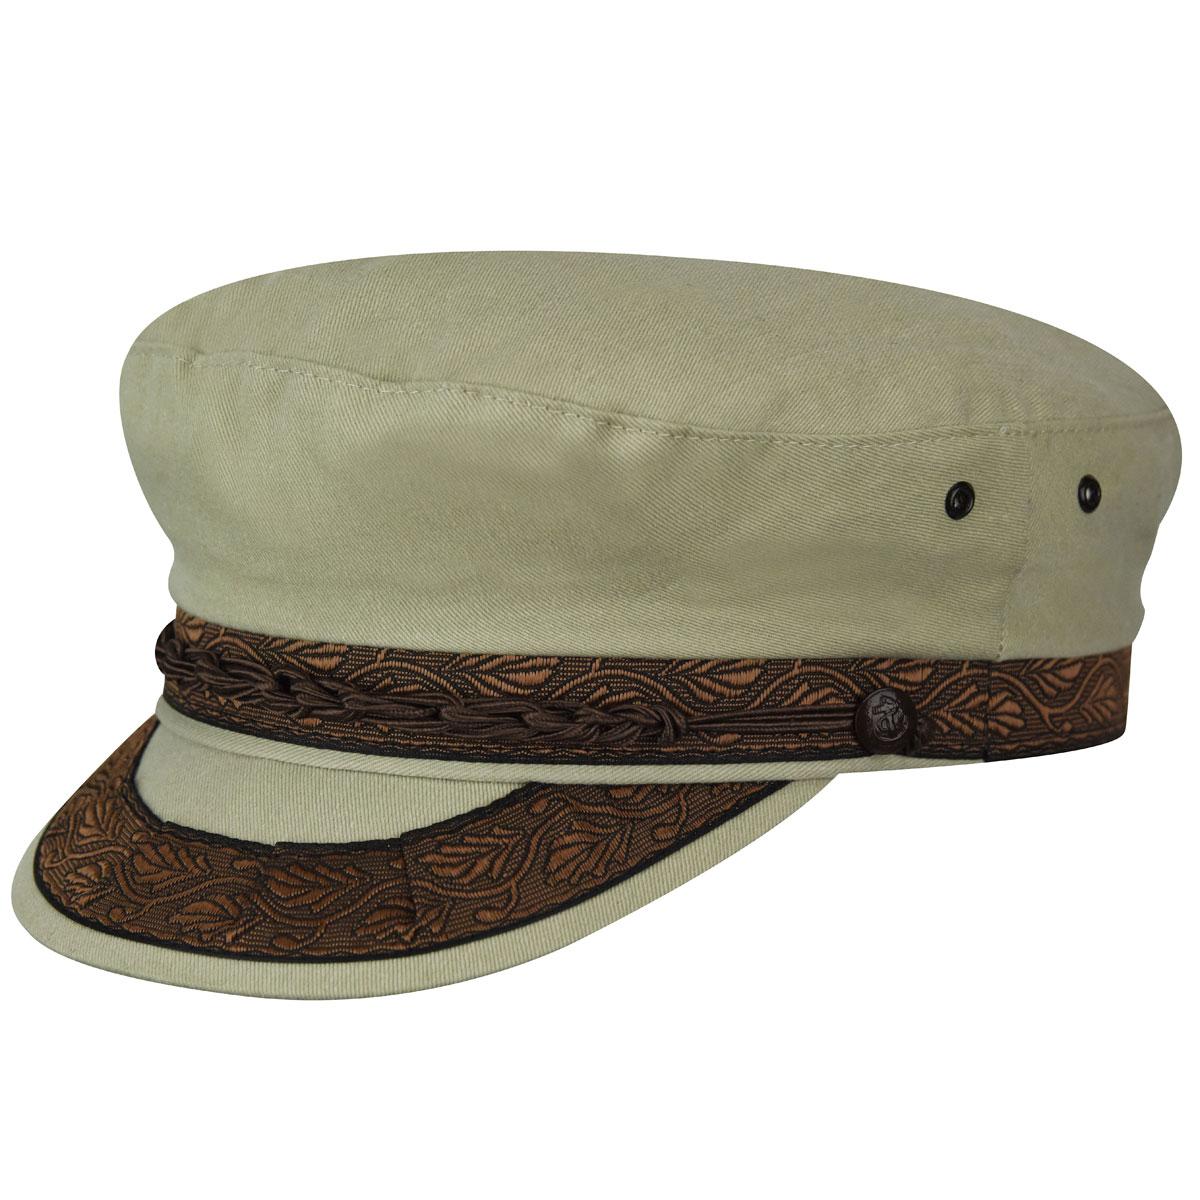 Country Gentleman Authentic Greek Cotton Cap in Tan